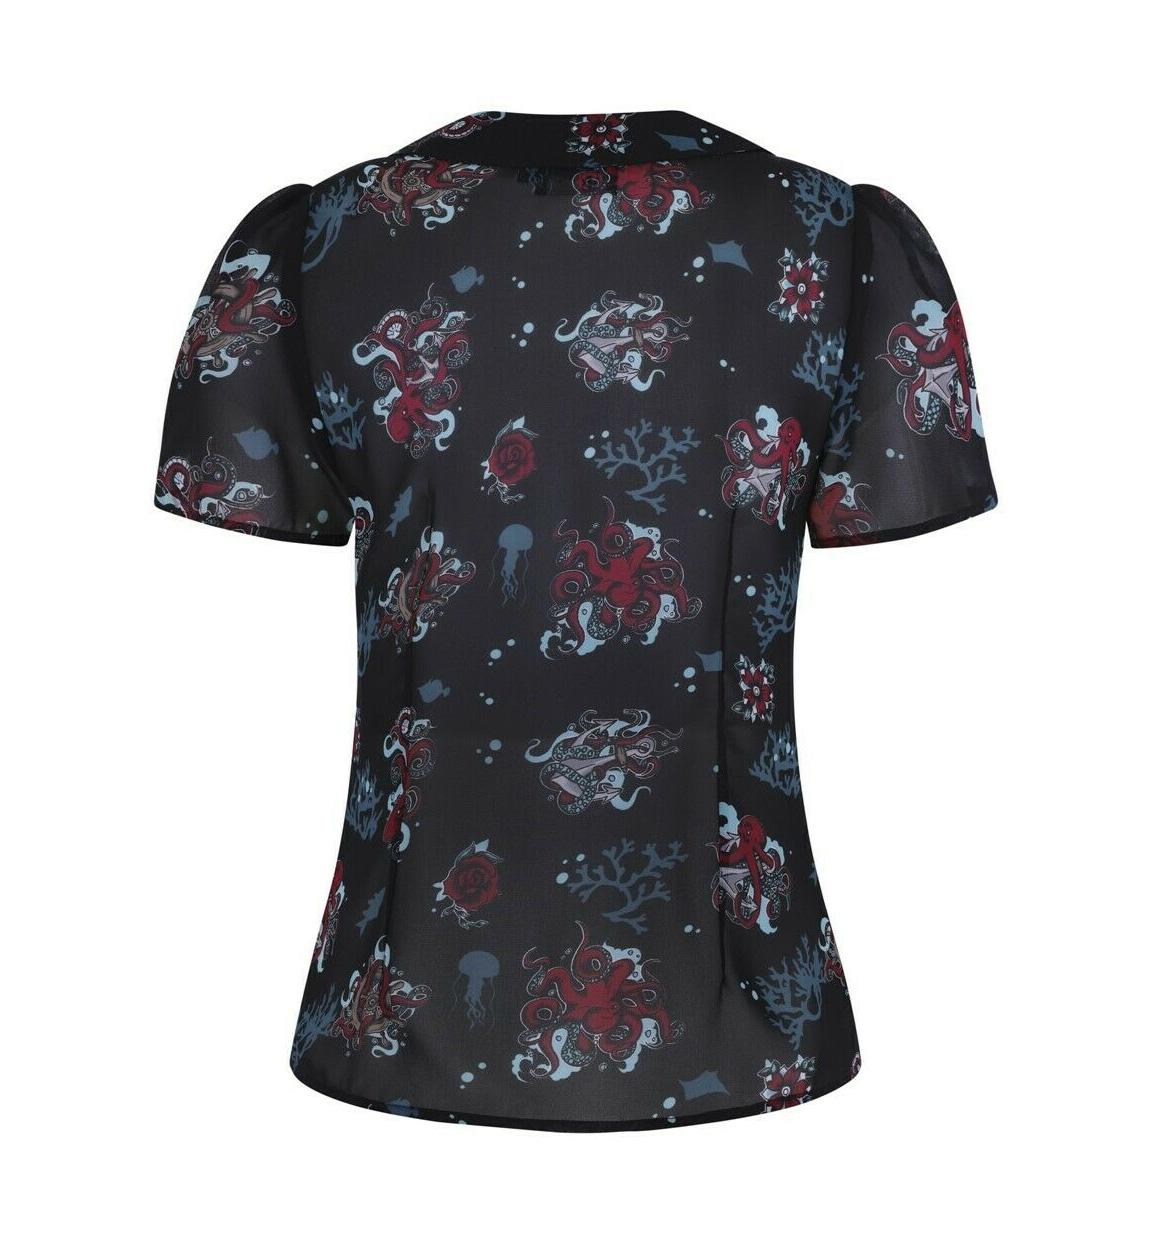 Hell-Bunny-50s-Shirt-Top-Black-Ocean-Octopus-Roses-POSEIDON-Blouse-All-Sizes thumbnail 7